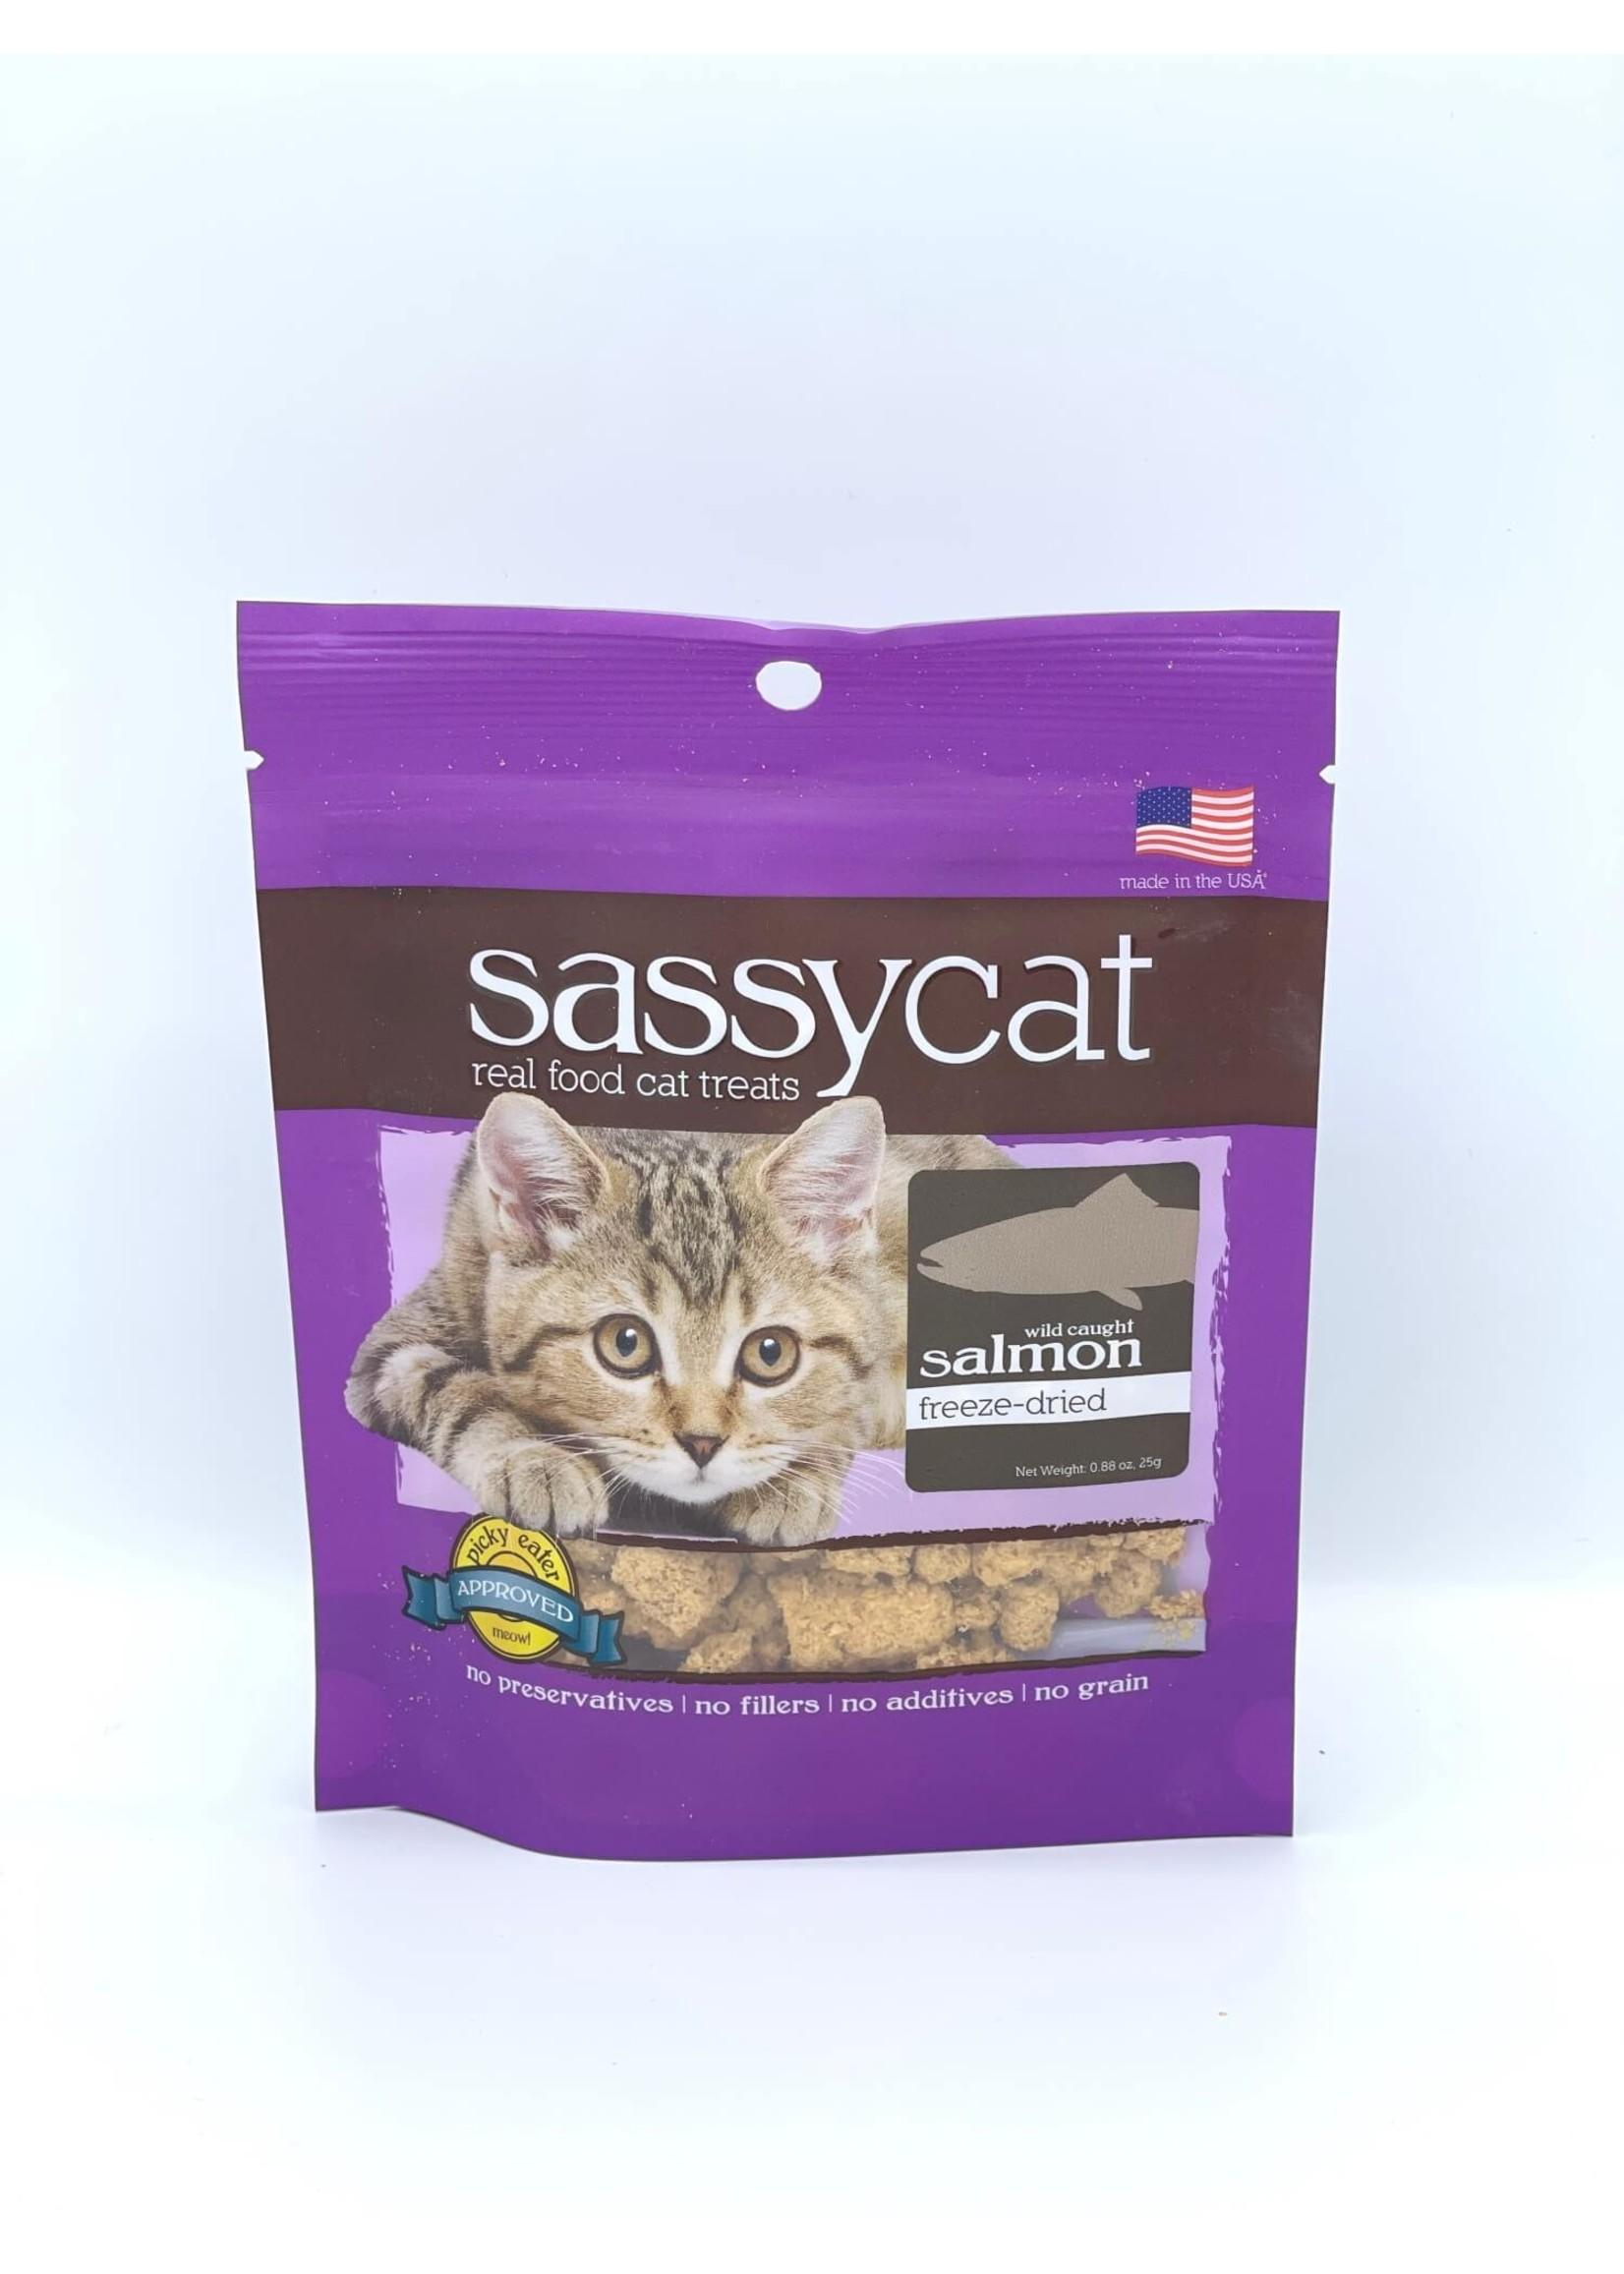 Herbsmith Herbsmith Sassy Cat Treats Salmon 1.25 oz